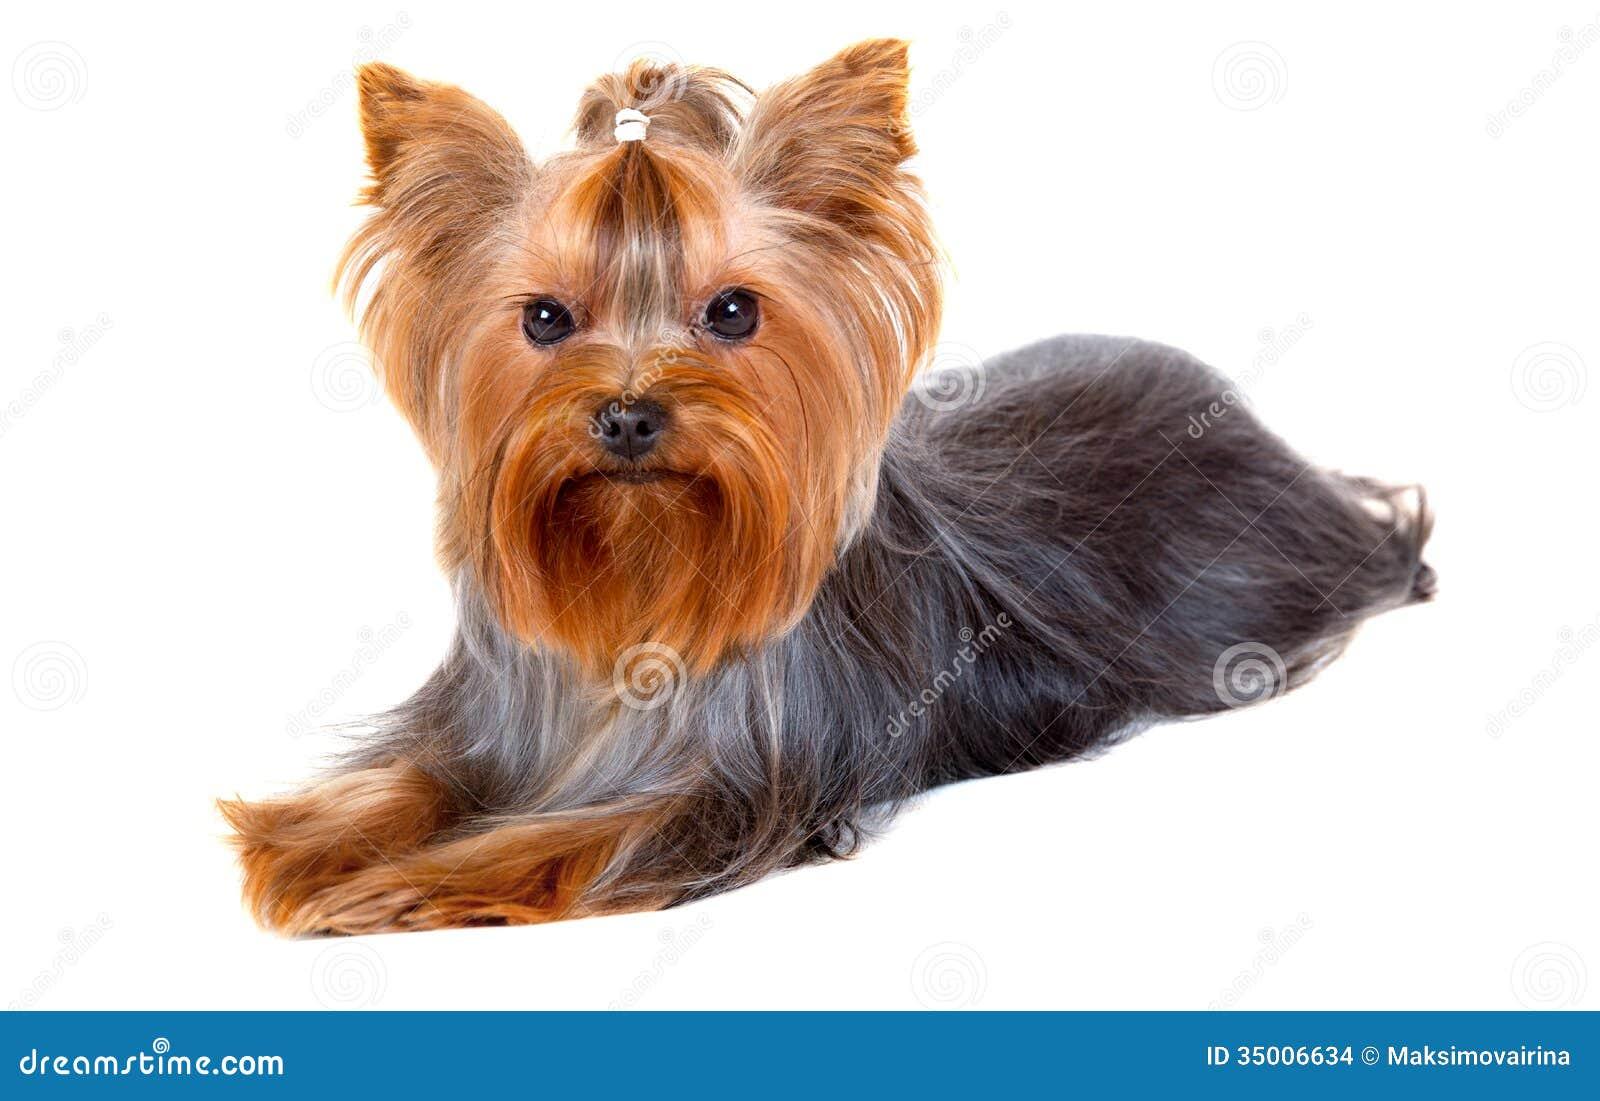 Yorkshire terrier haircut